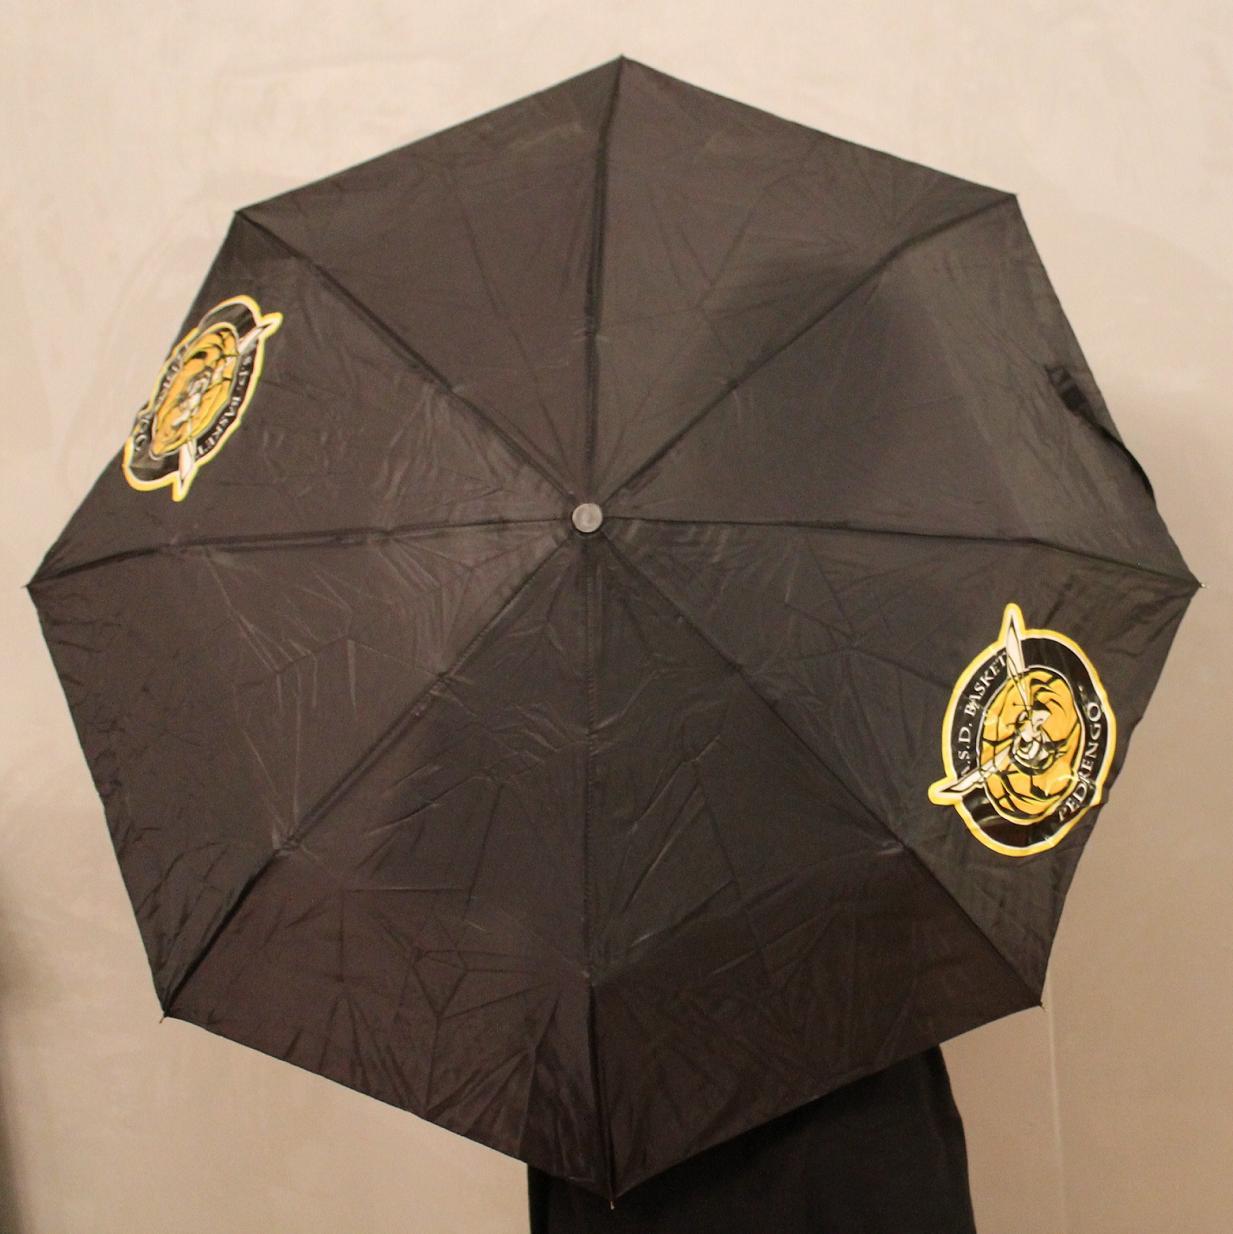 2016-17 Merchandising ombrello